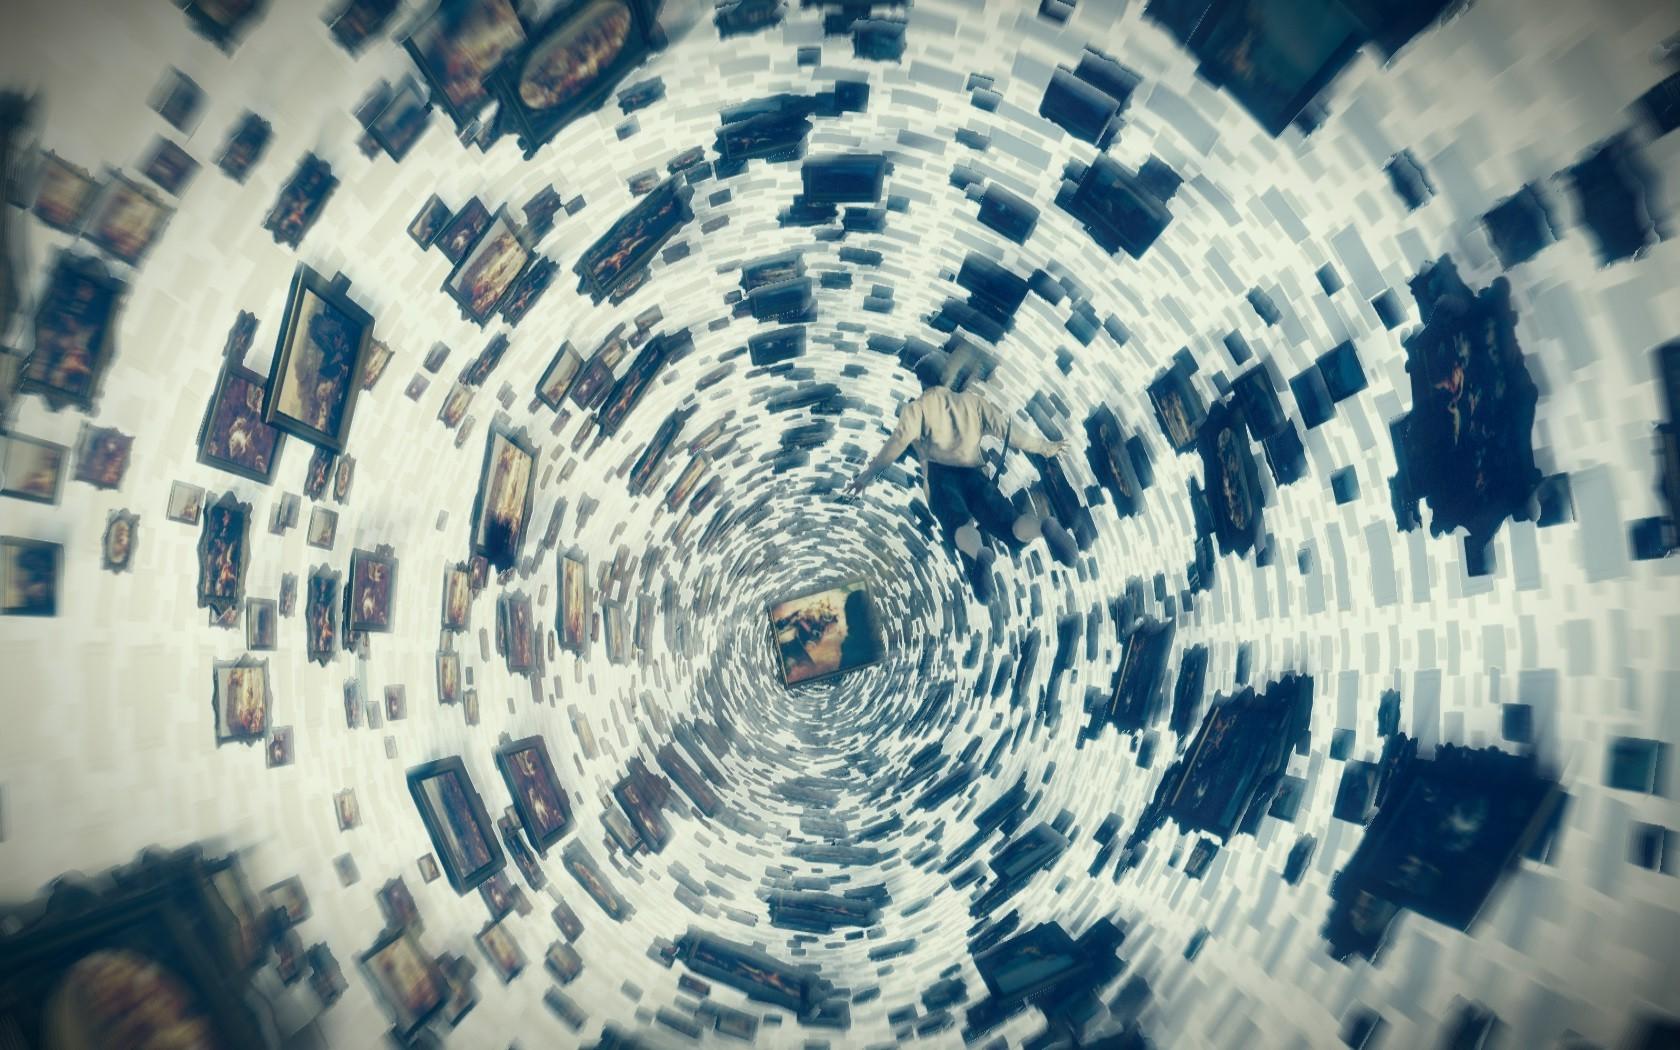 Fondos de pantalla : arte digital, videojuegos, espacio, reflexión ...